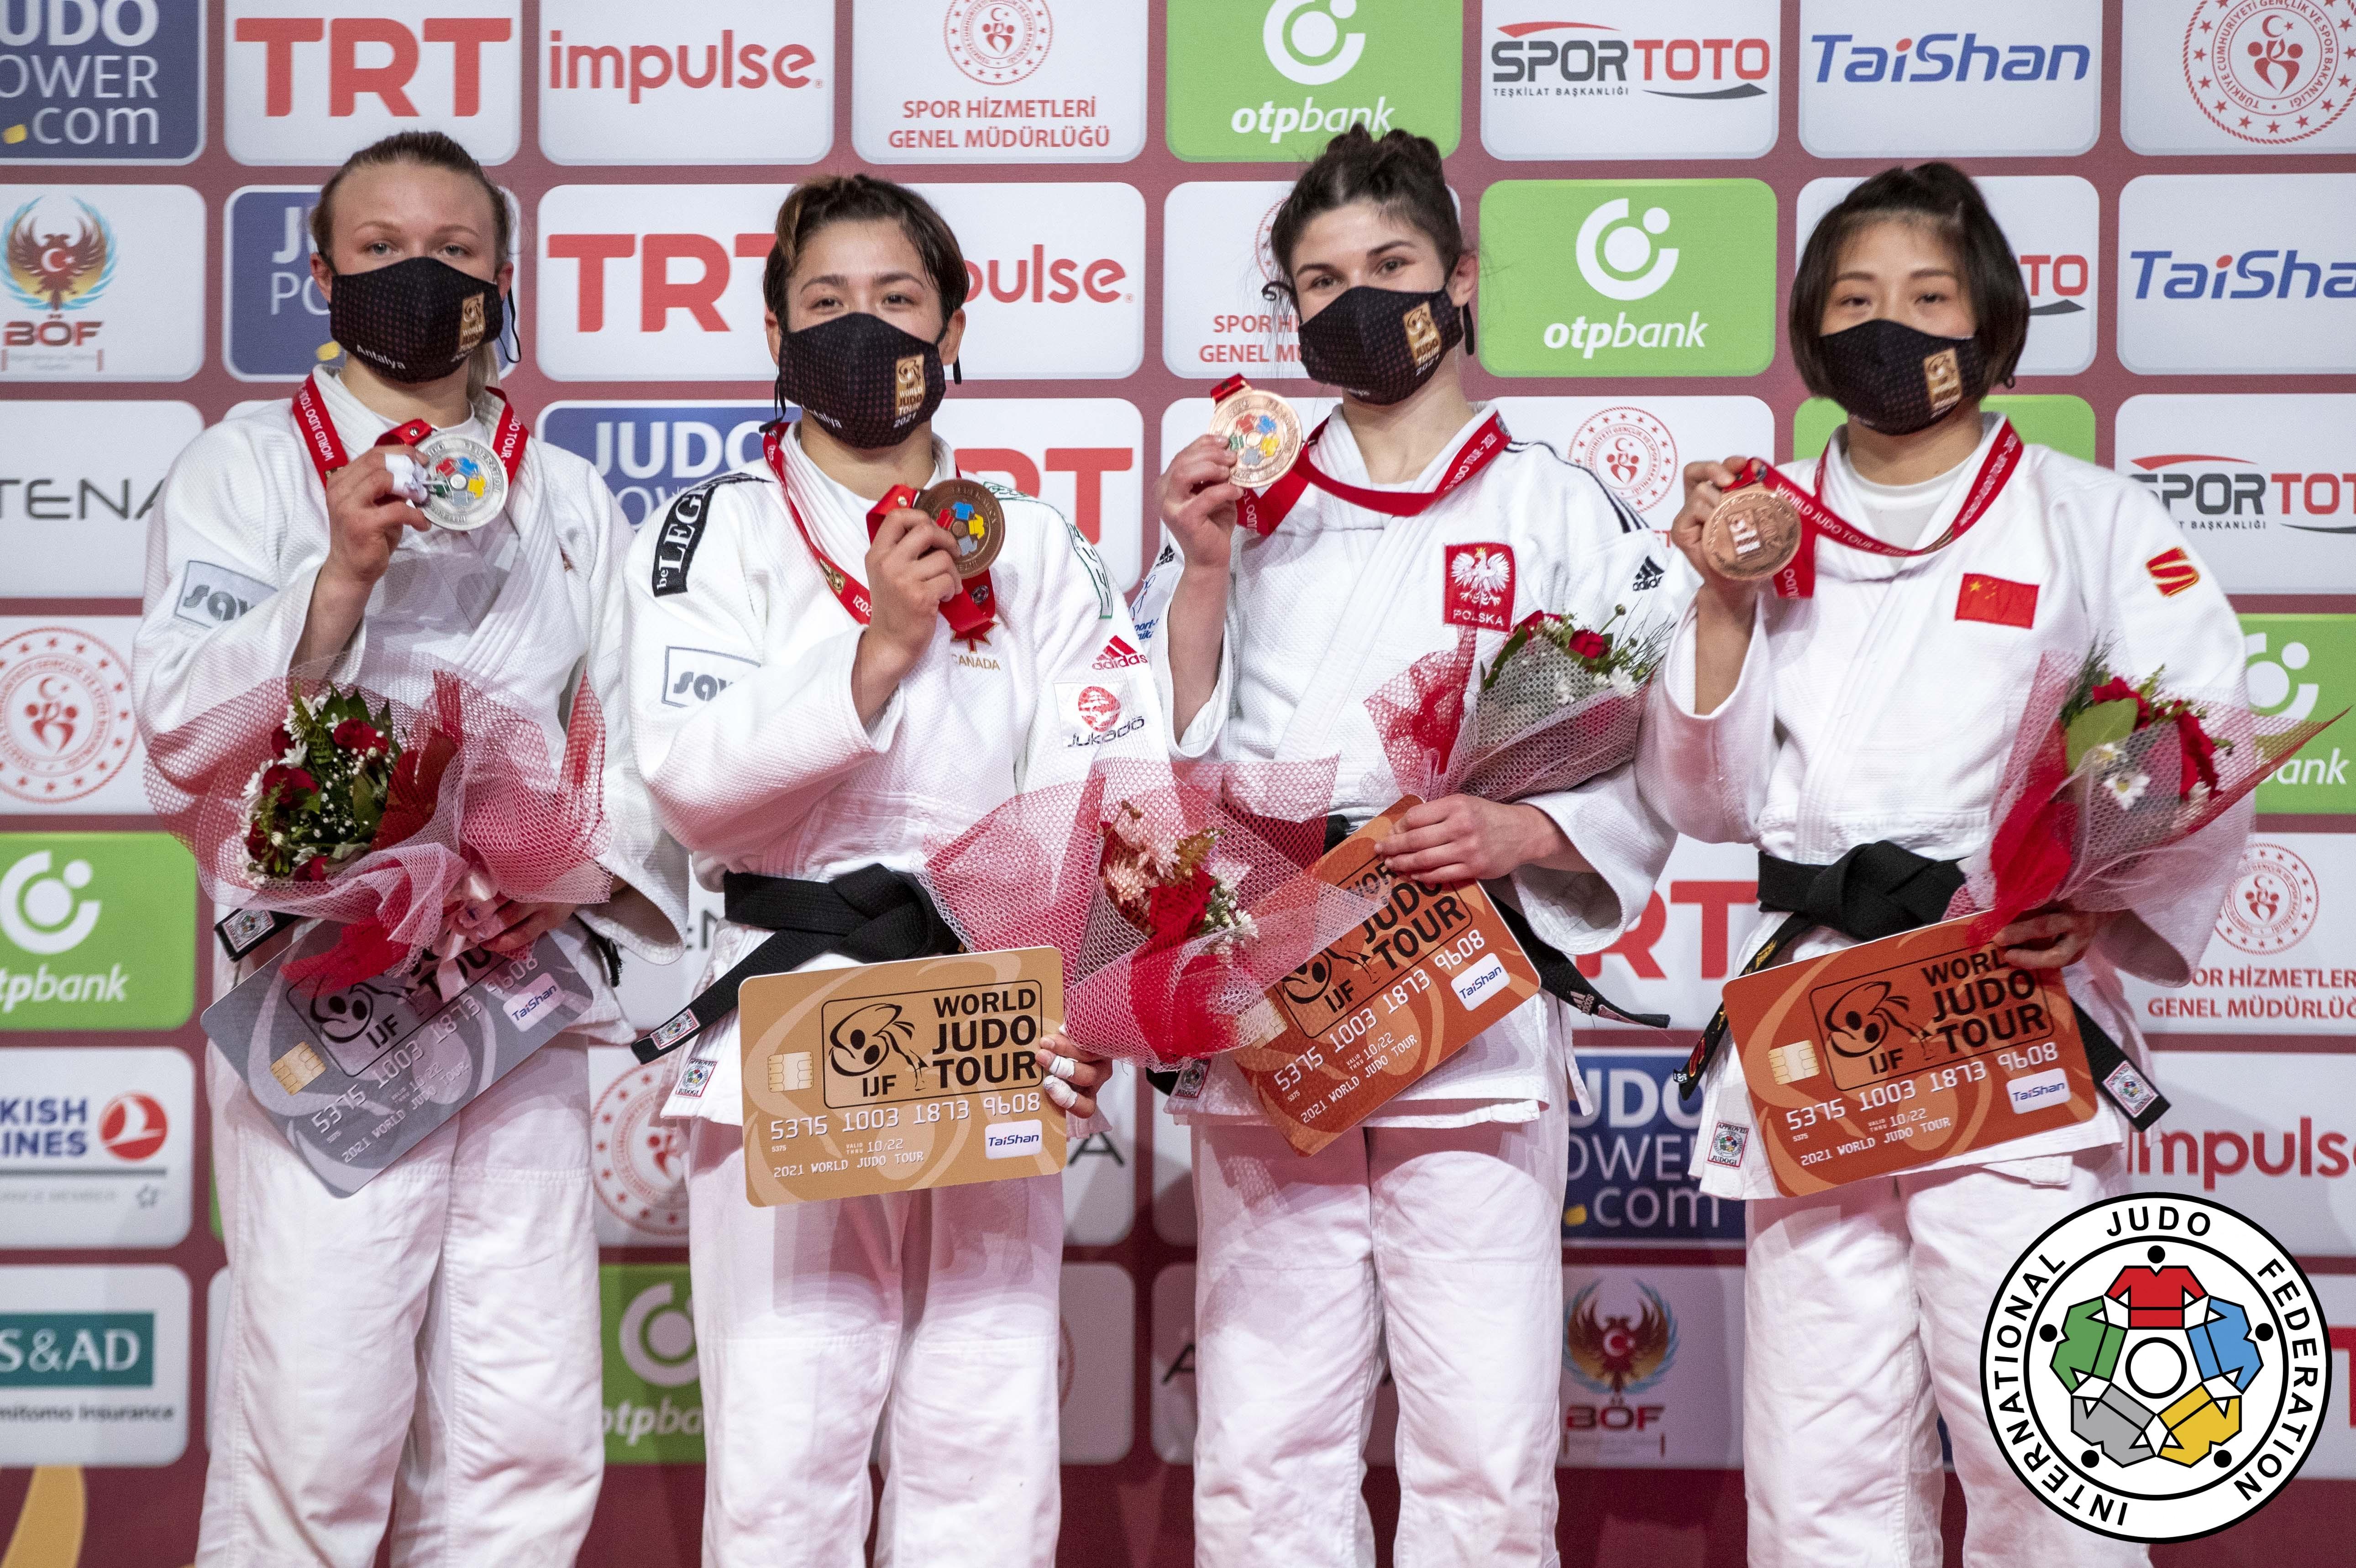 Four female judokas on podium